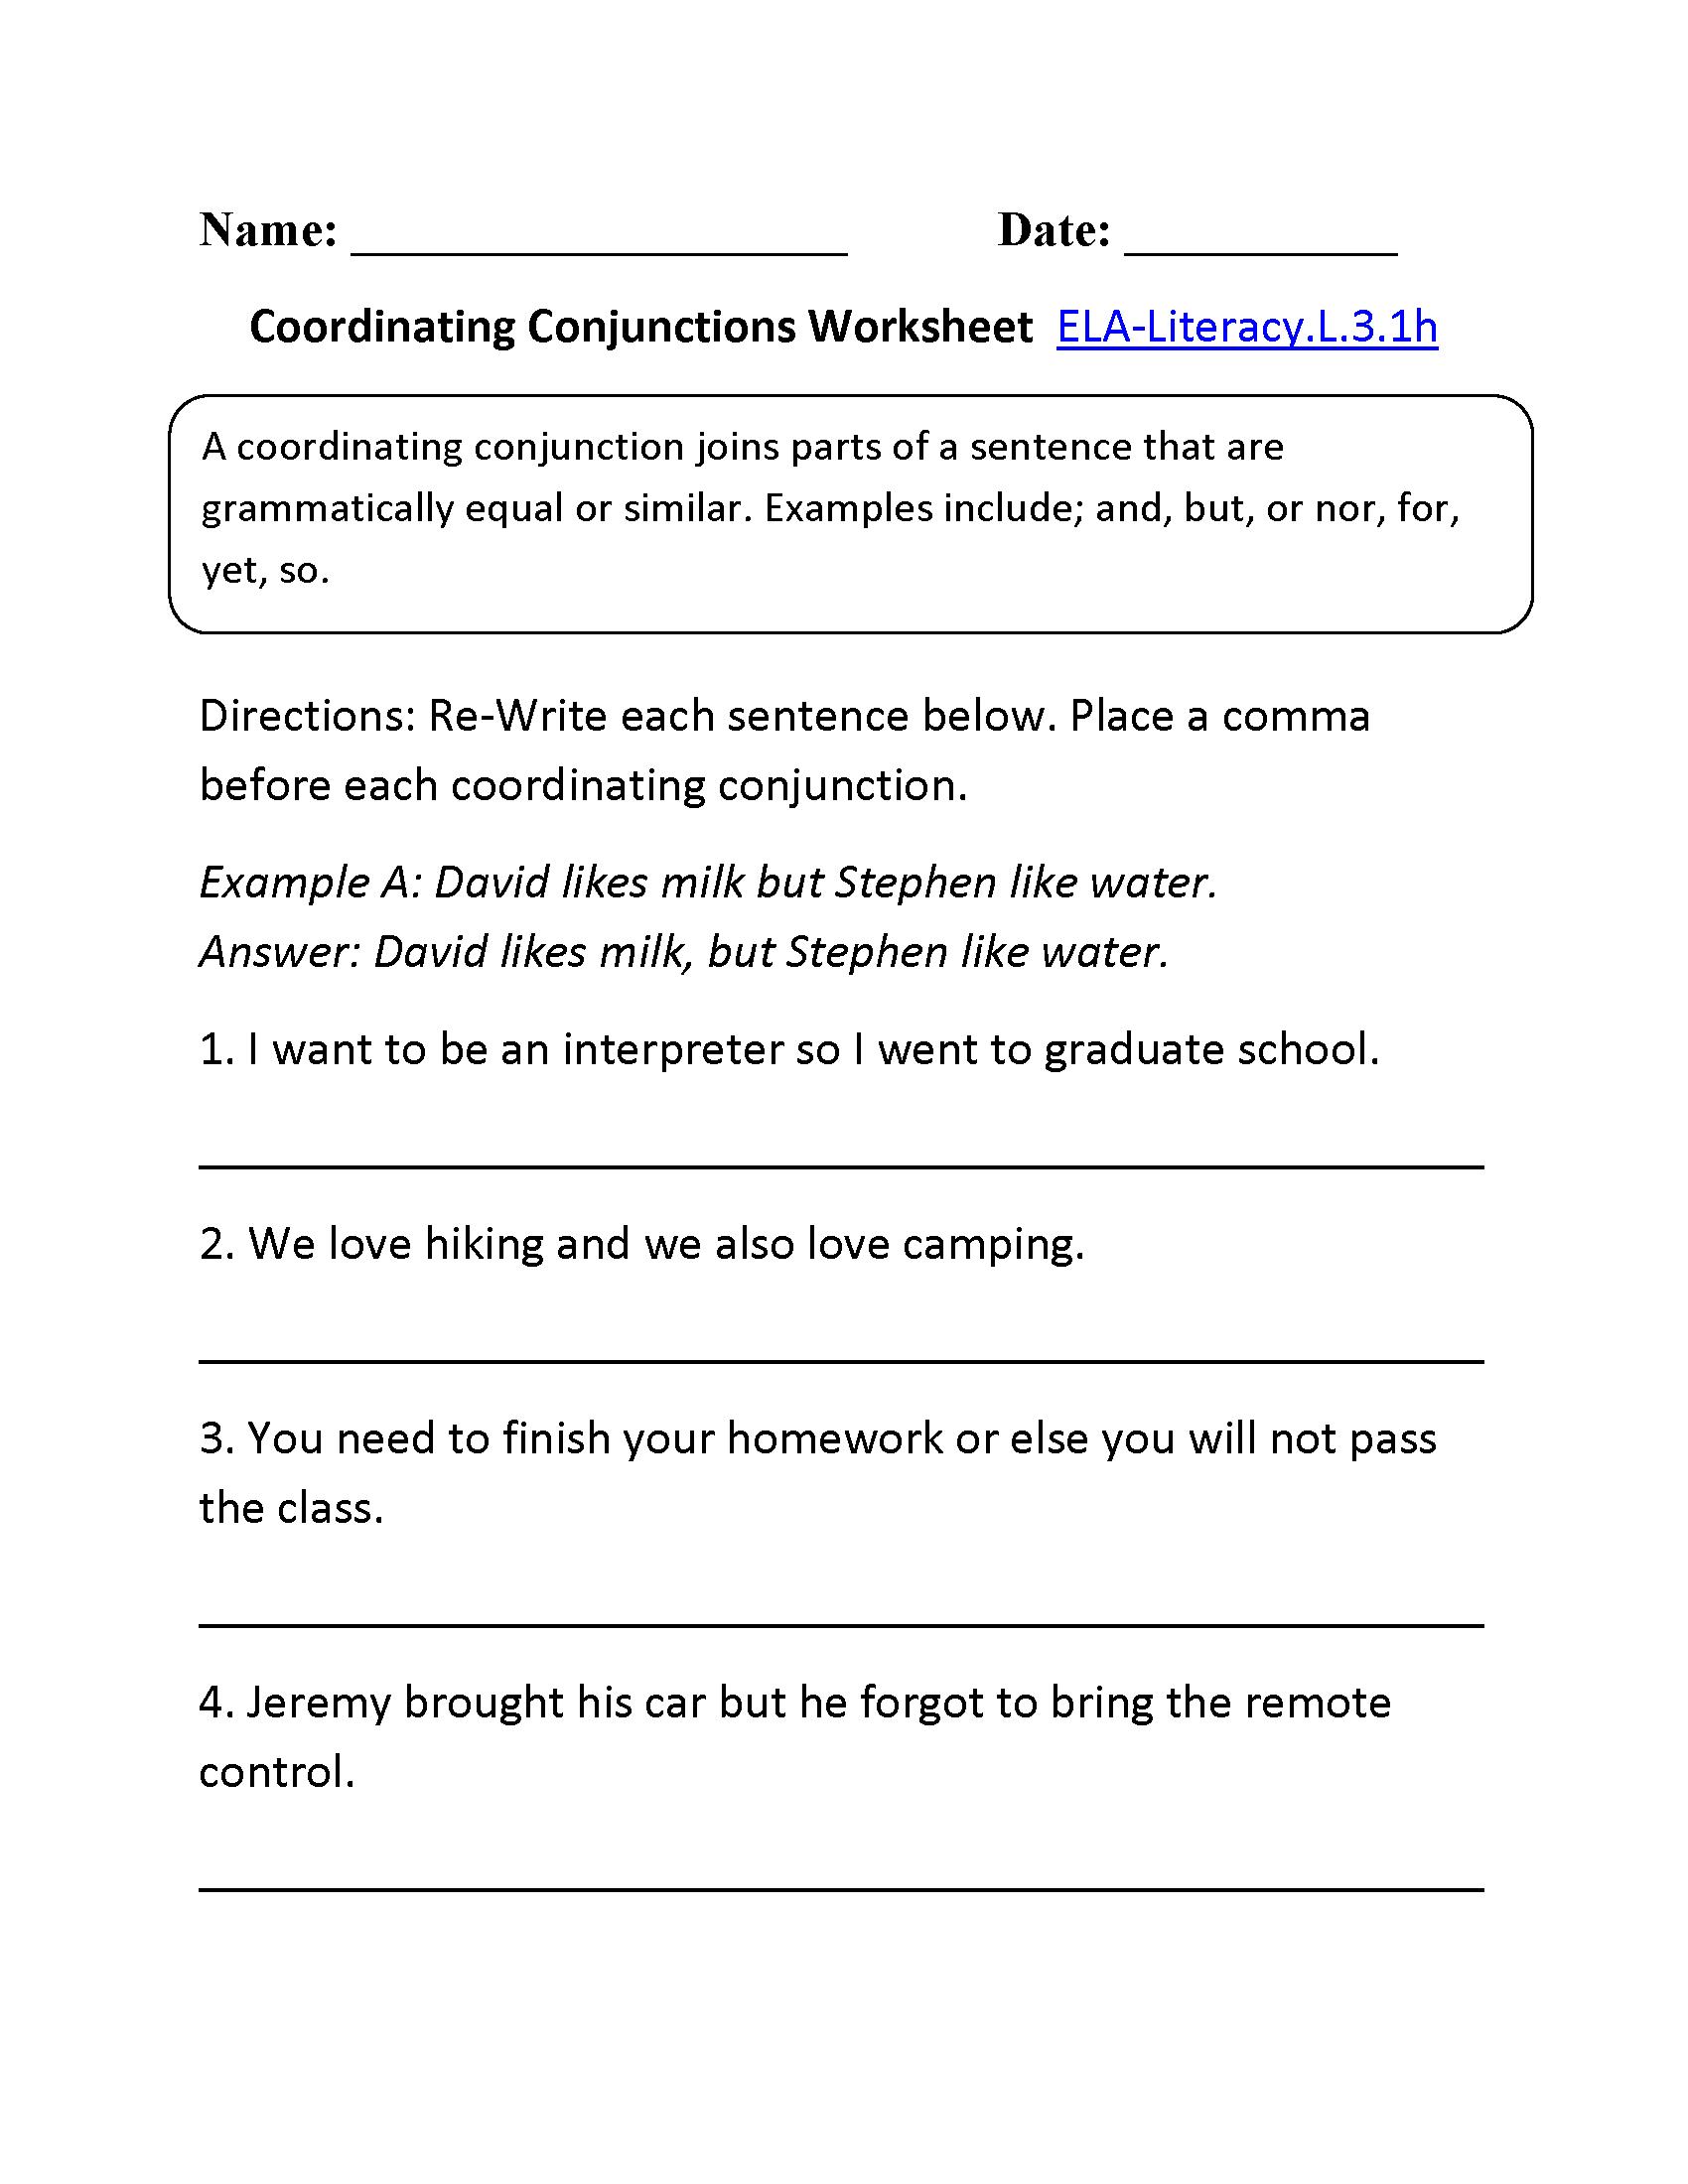 Coordinating Conjunctions Worksheet 1 (L.3.1) | L.3.1 | English | 3Rd Grade English Worksheets Printable